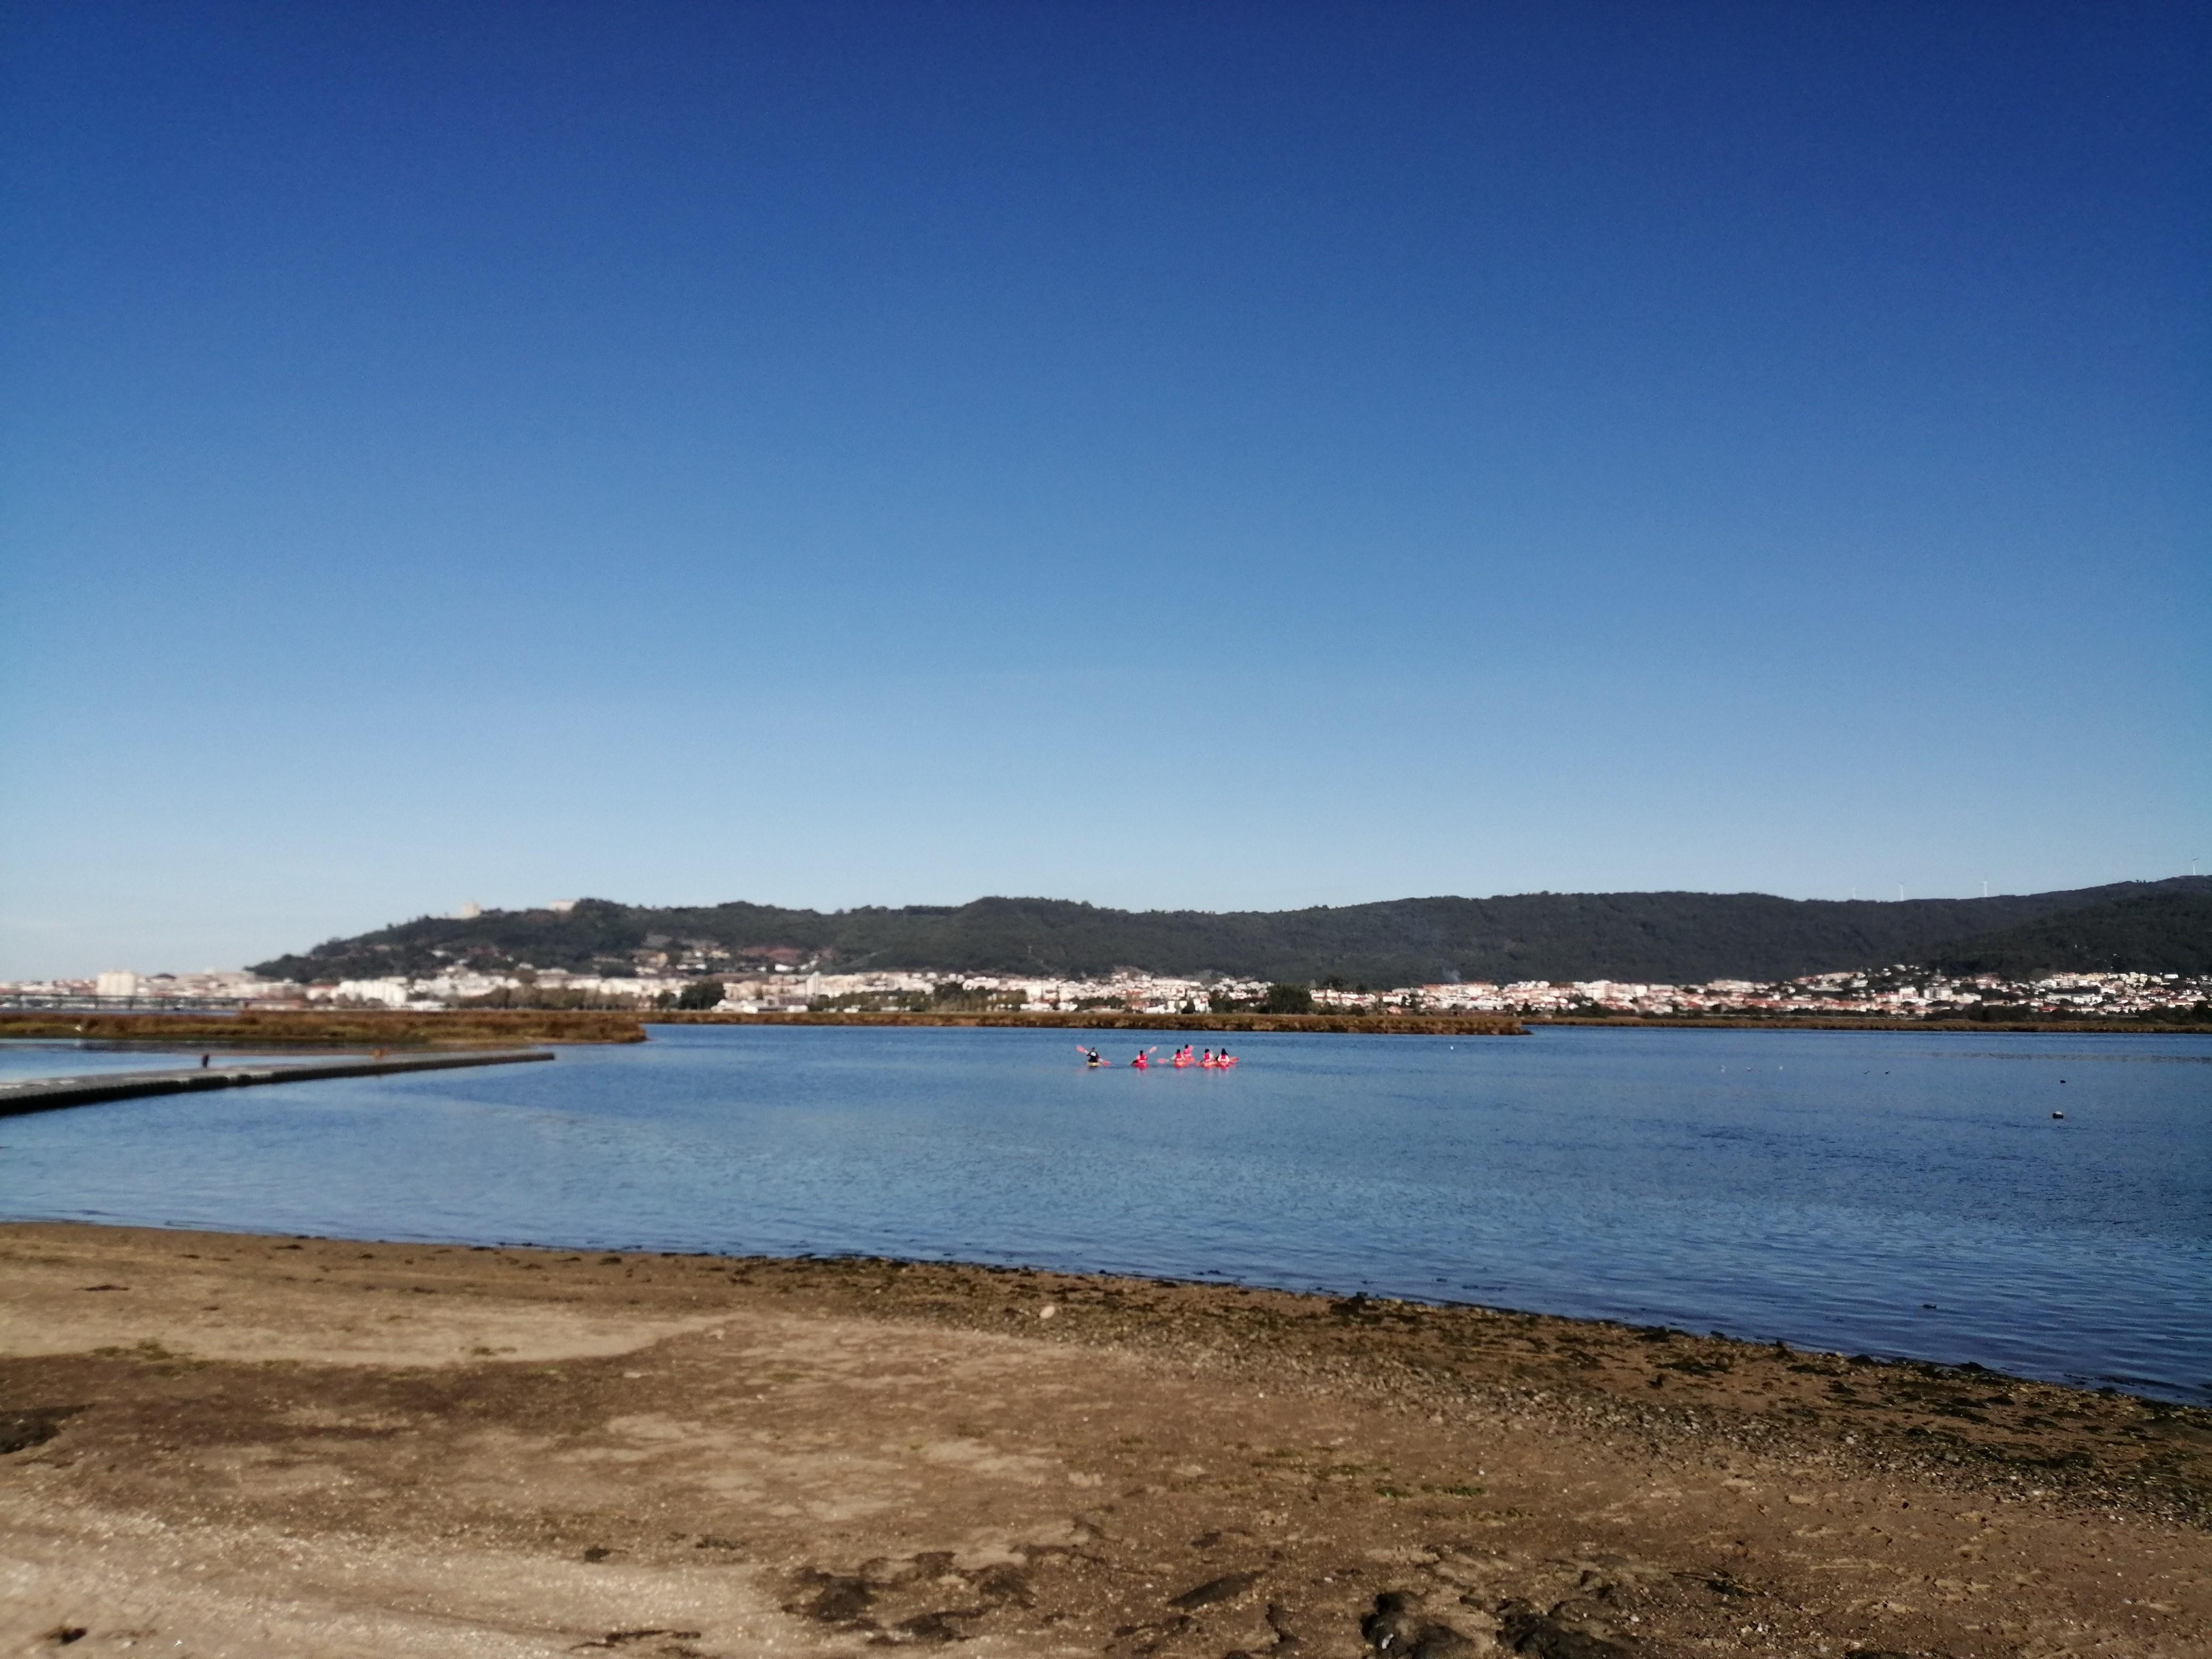 Muelle de Darque, Viana do Castelo